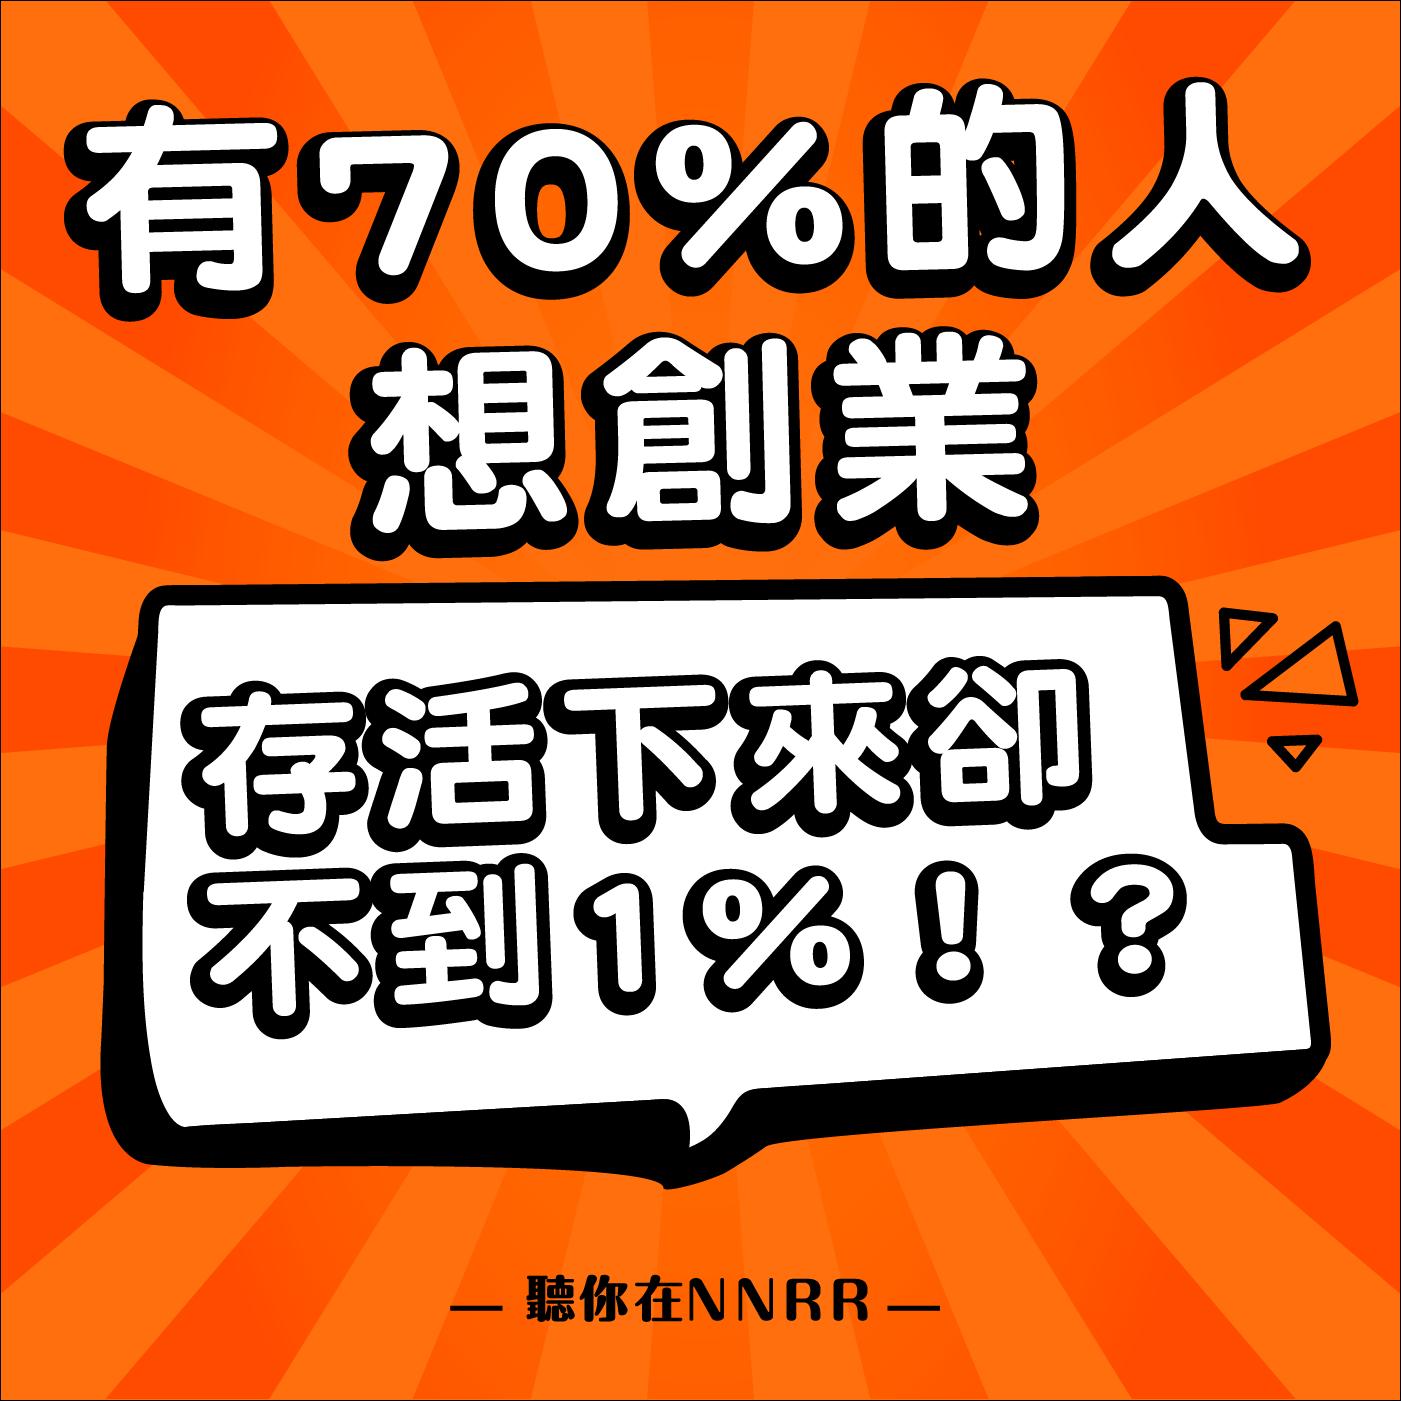 EP.6 有90%的人創業,活下來的卻不到1%!? | 聽你在NNRR